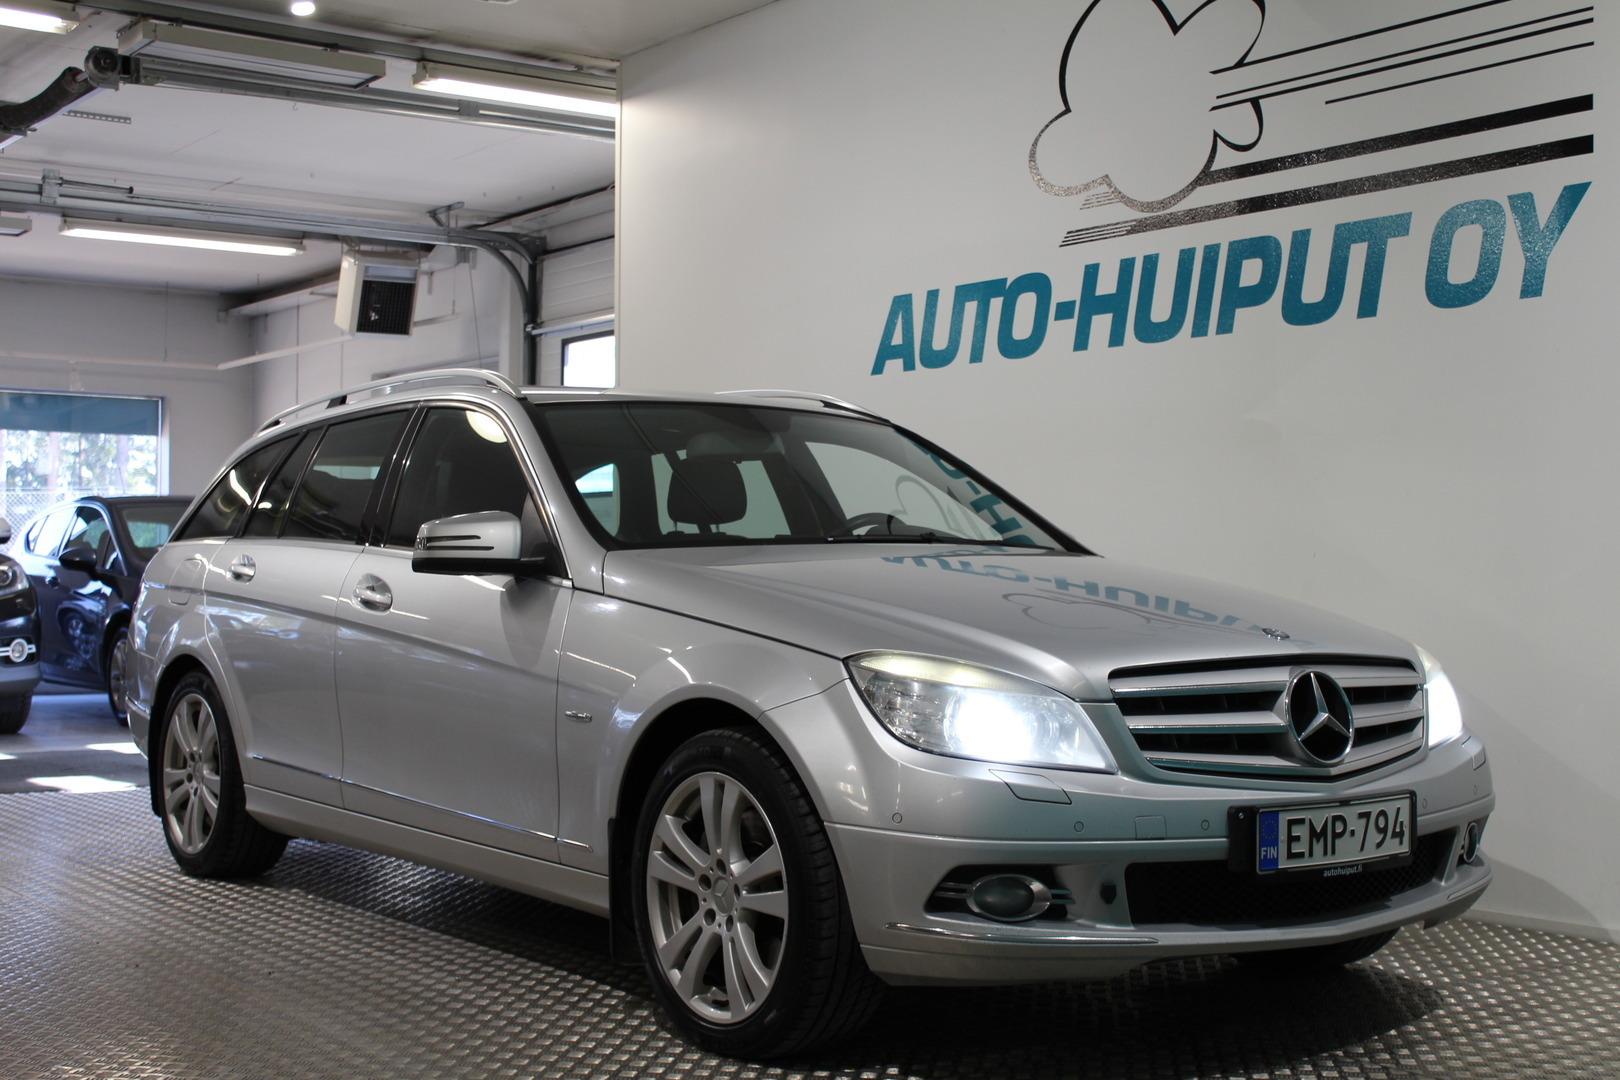 Mercedes-Benz C, 350 CDI T A Avantgarde 7G-Tronic #Todella hyvin pidetty #Hieno! #Voimakas